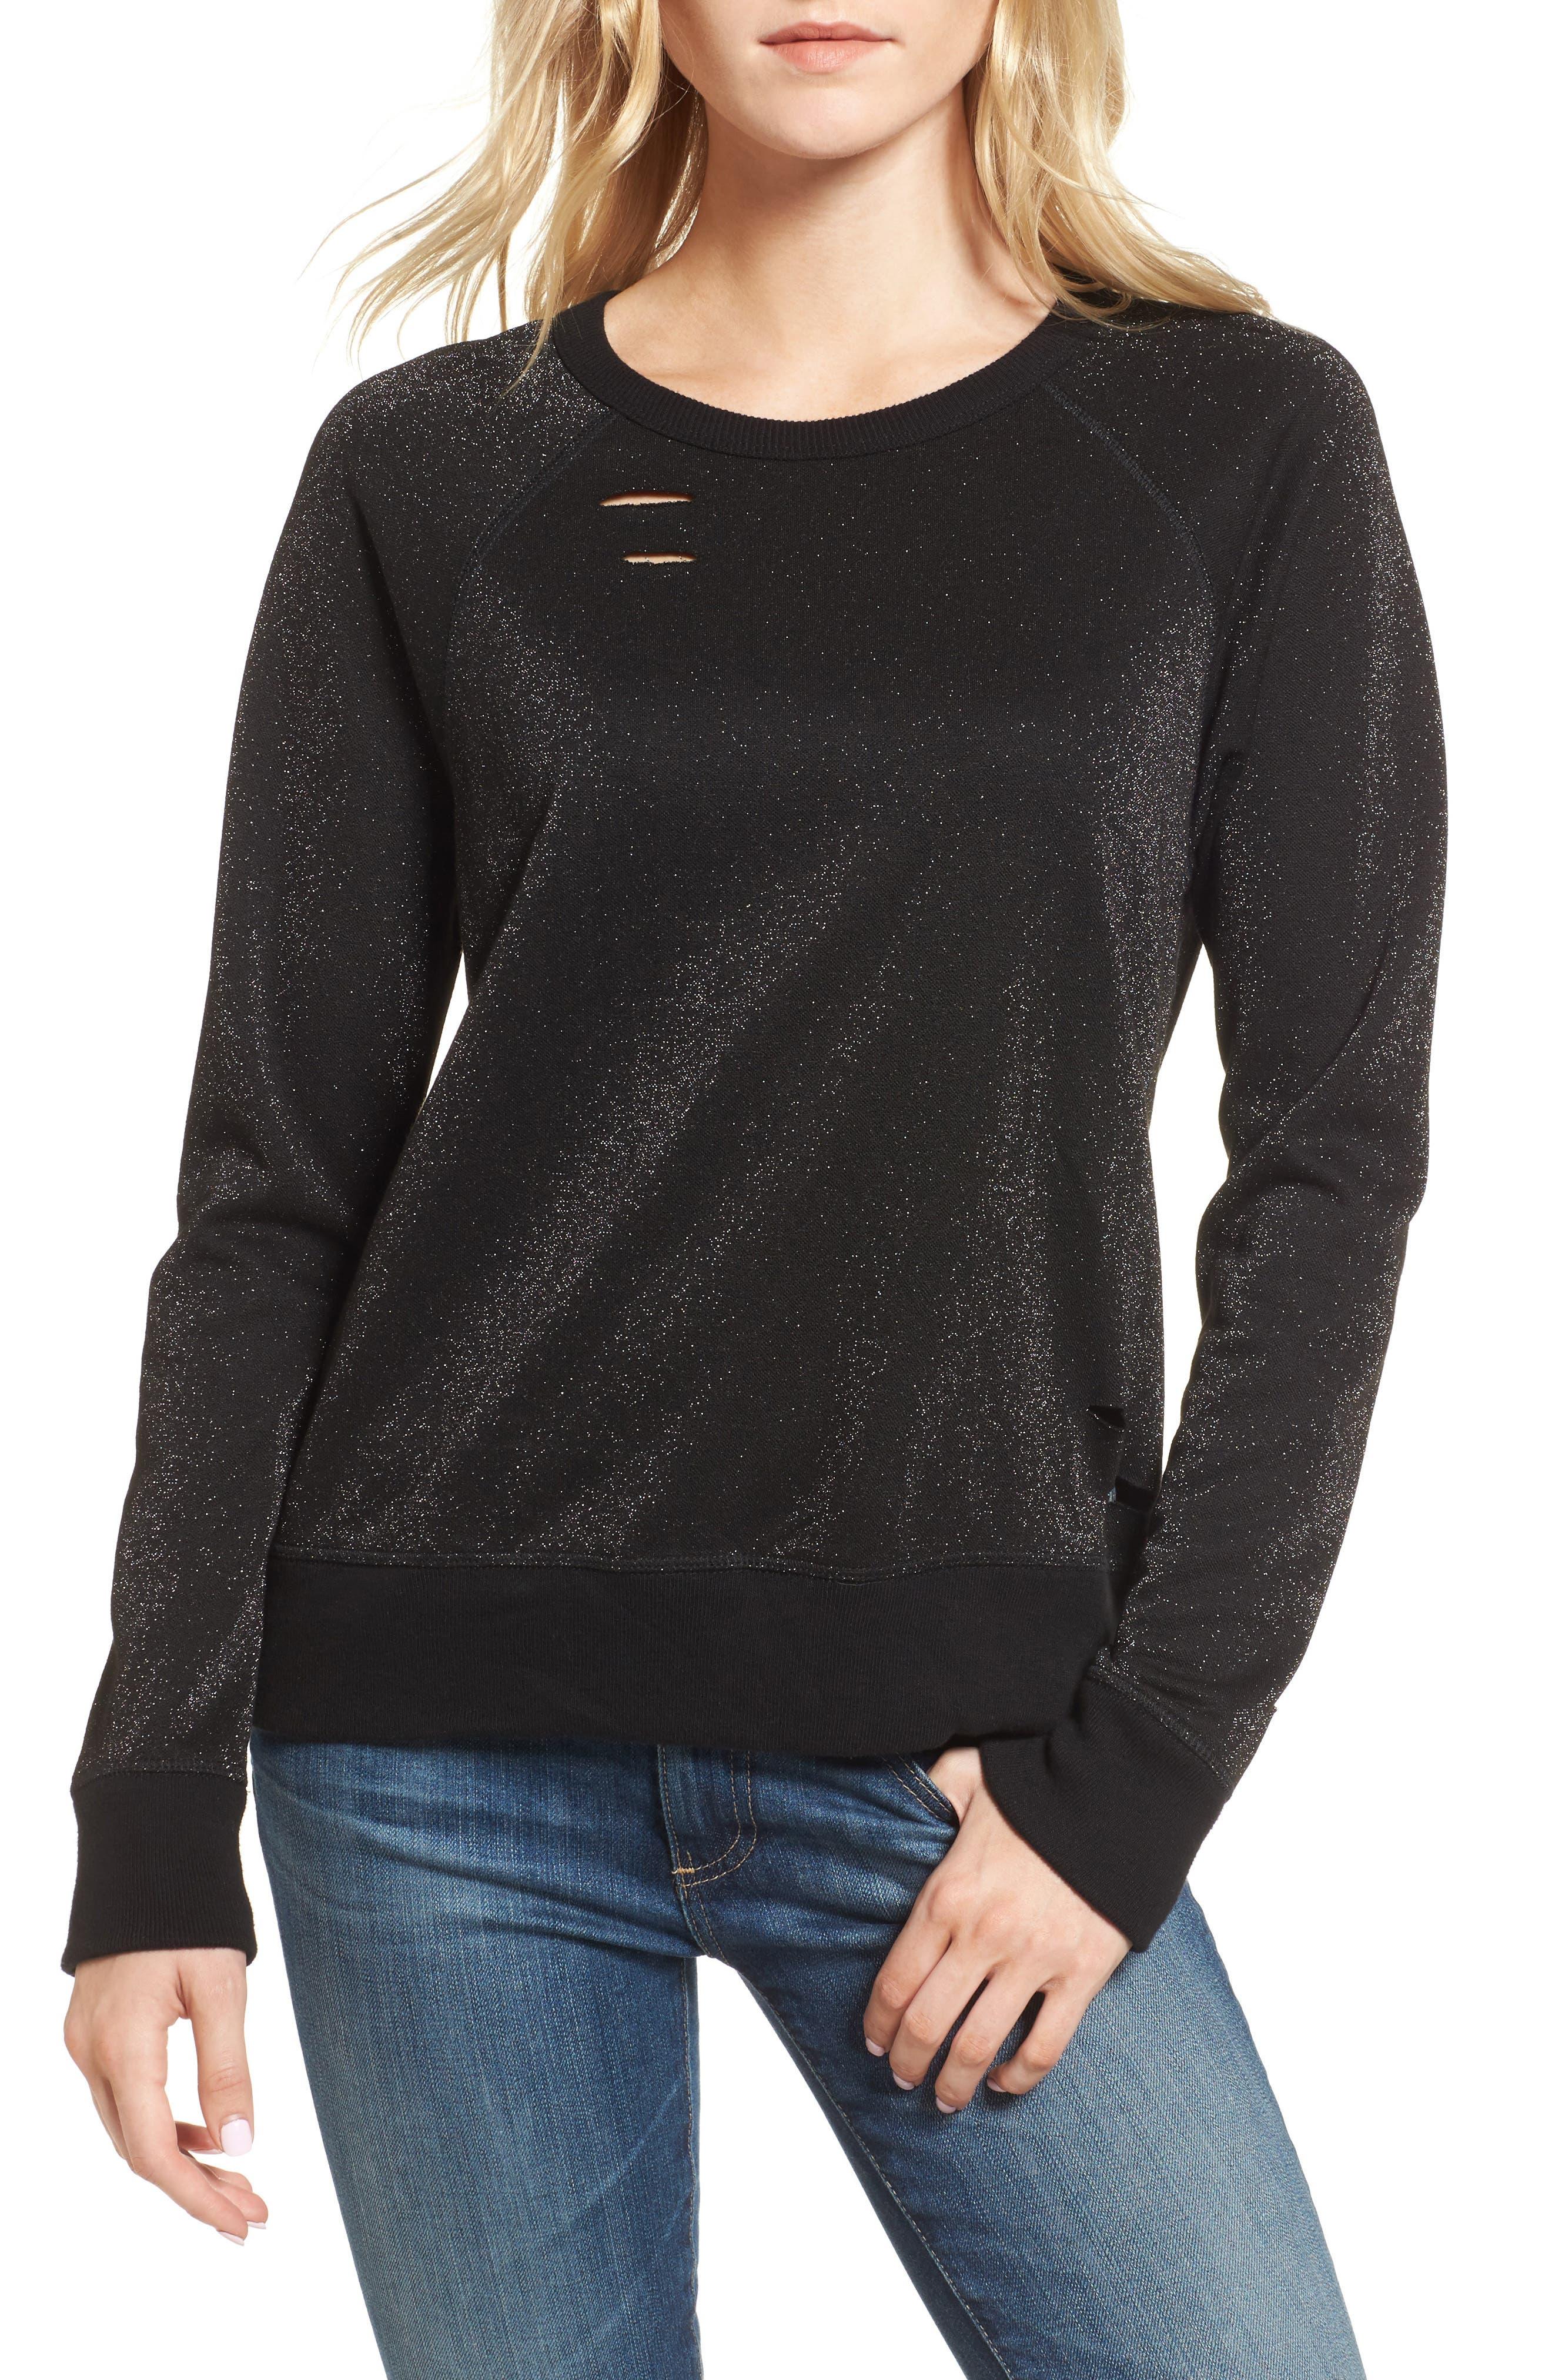 Fuller Sweatshirt,                         Main,                         color, Metallic Black Cat